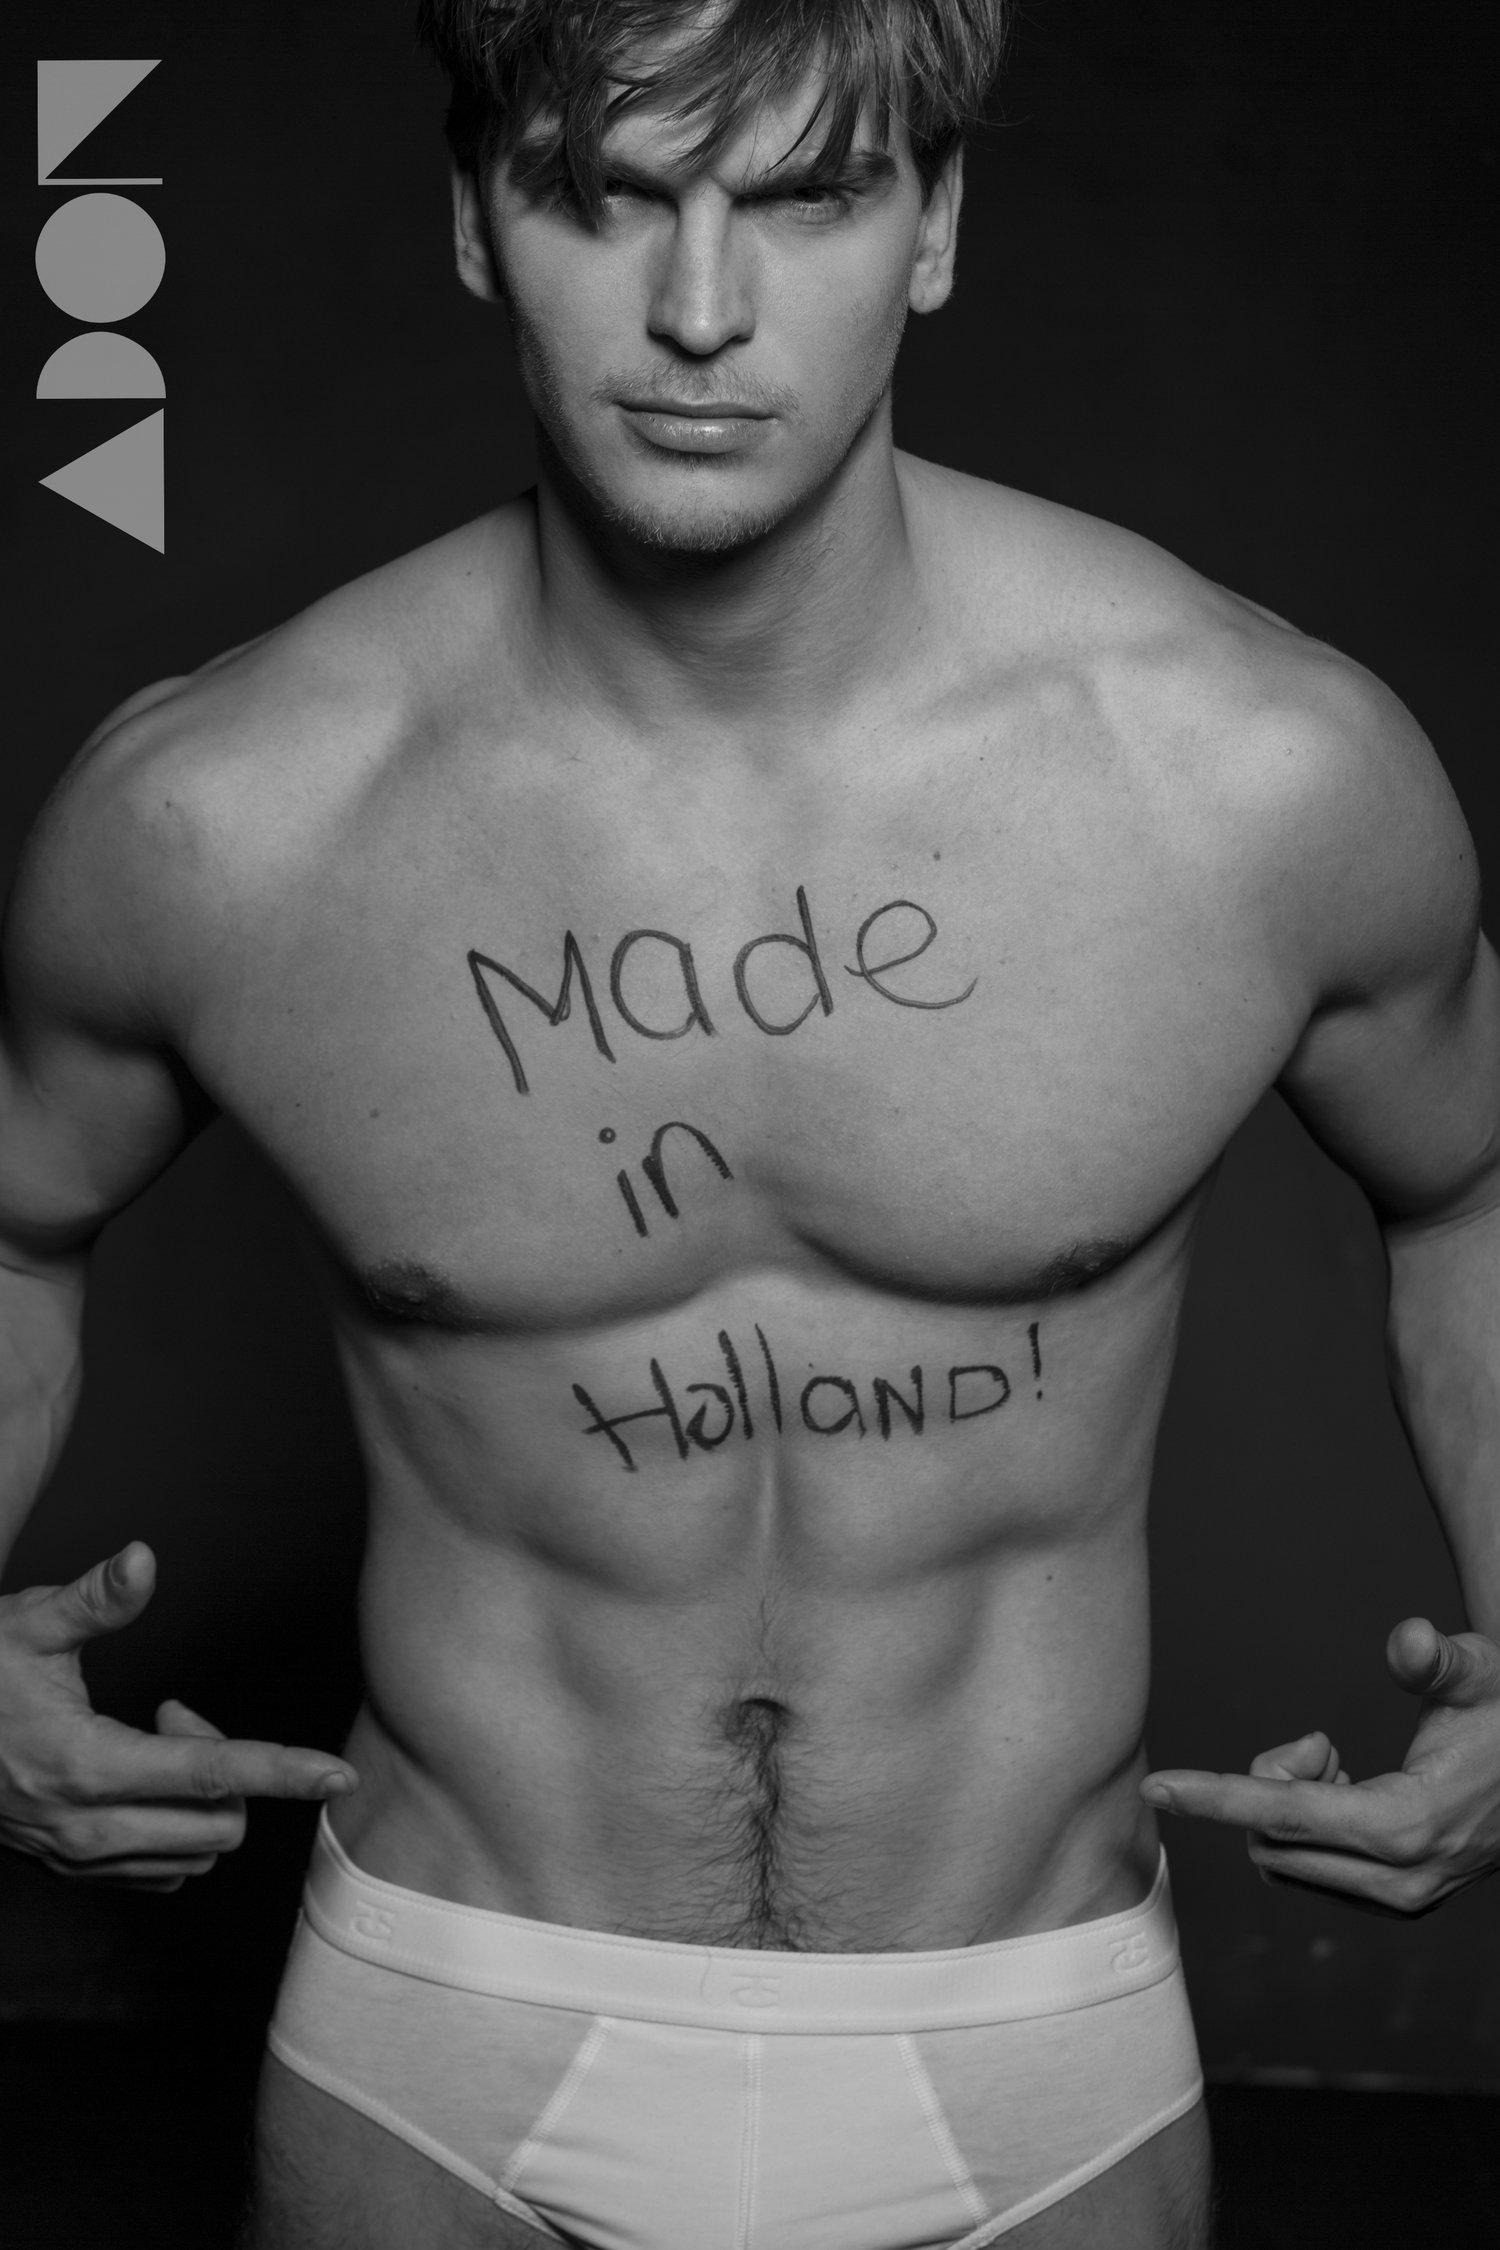 Adon Exclusive: Model Ronny East By Paul Van Der Linde